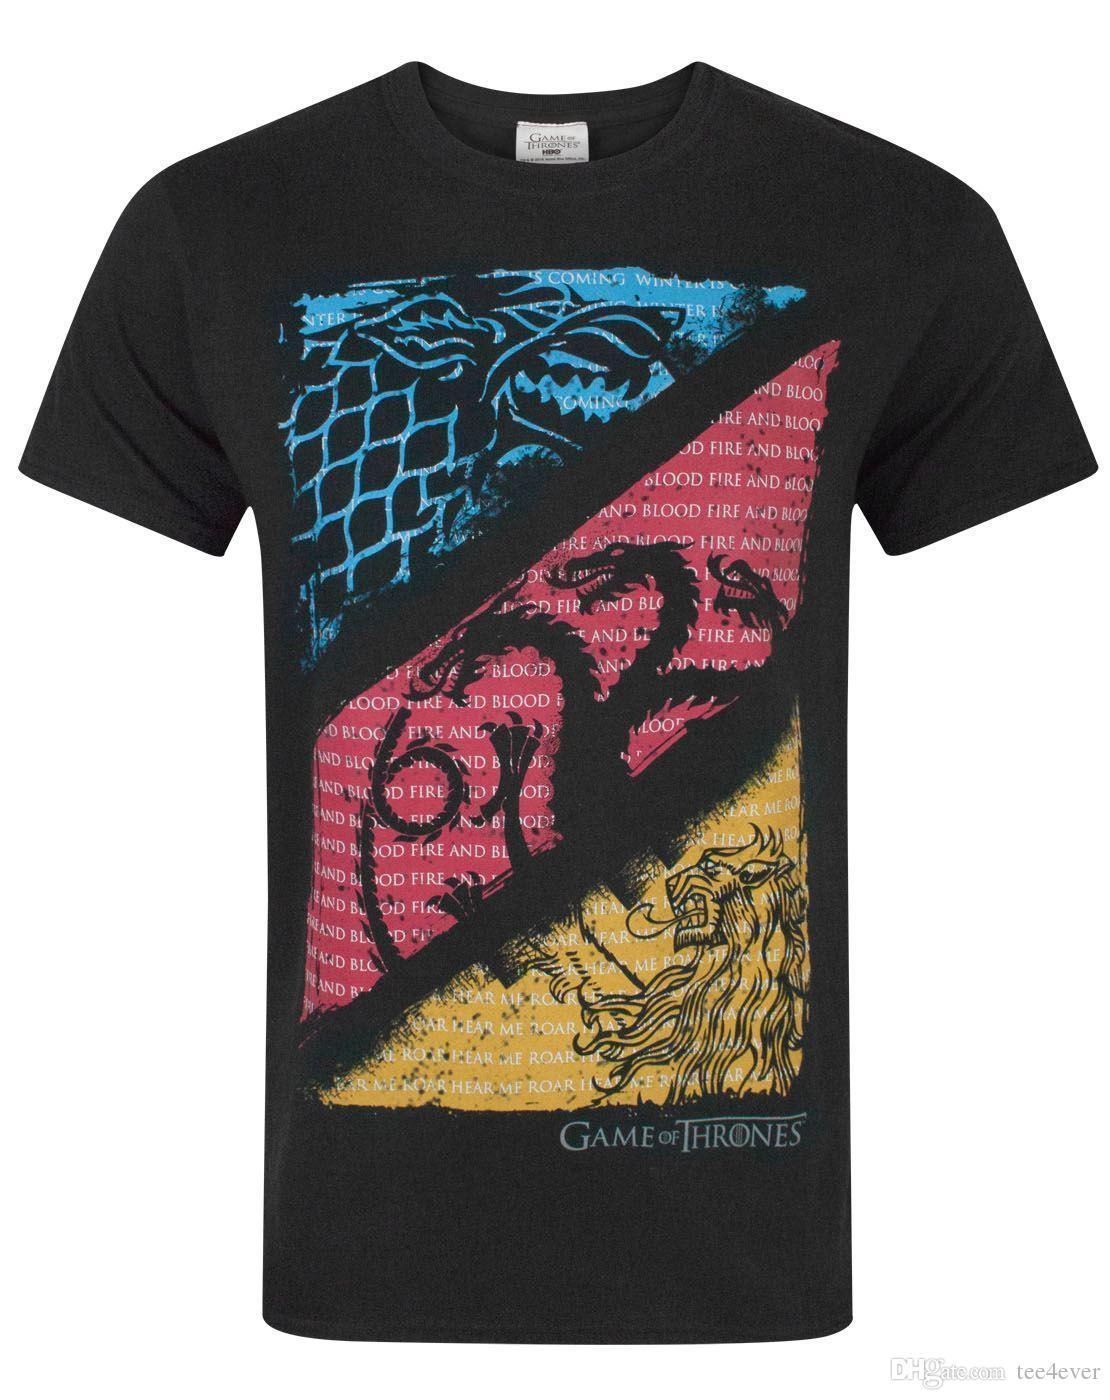 6da2343962 On Sale New Fashion Summer Game Of Thrones House Sigil Quotes Men's T-Shirt  100% Cotton Men Women T Shirt Tees Custom